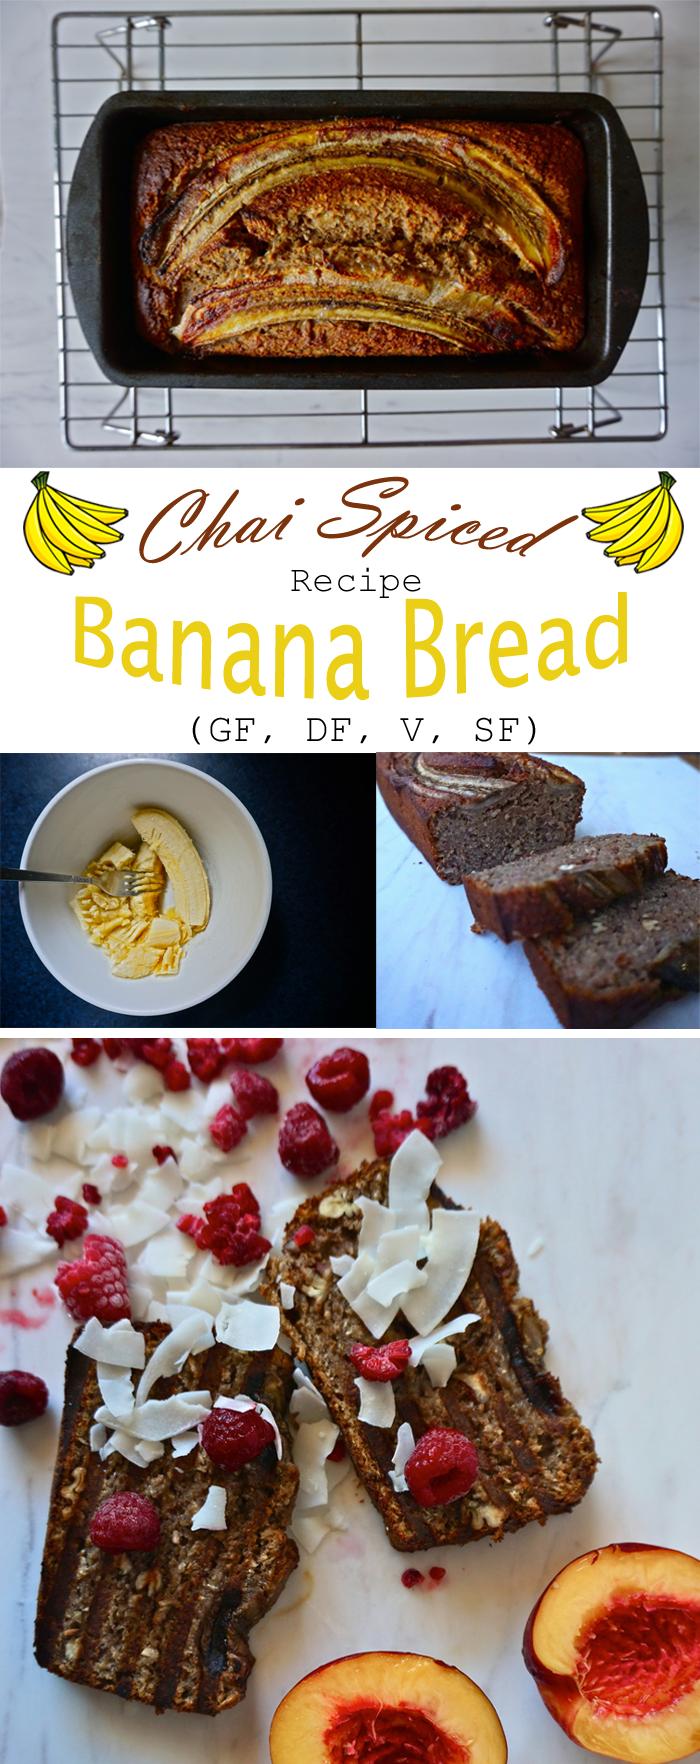 Chai Spiced Banana Bread | Gluten Free, Dairy Free | Full Recipe